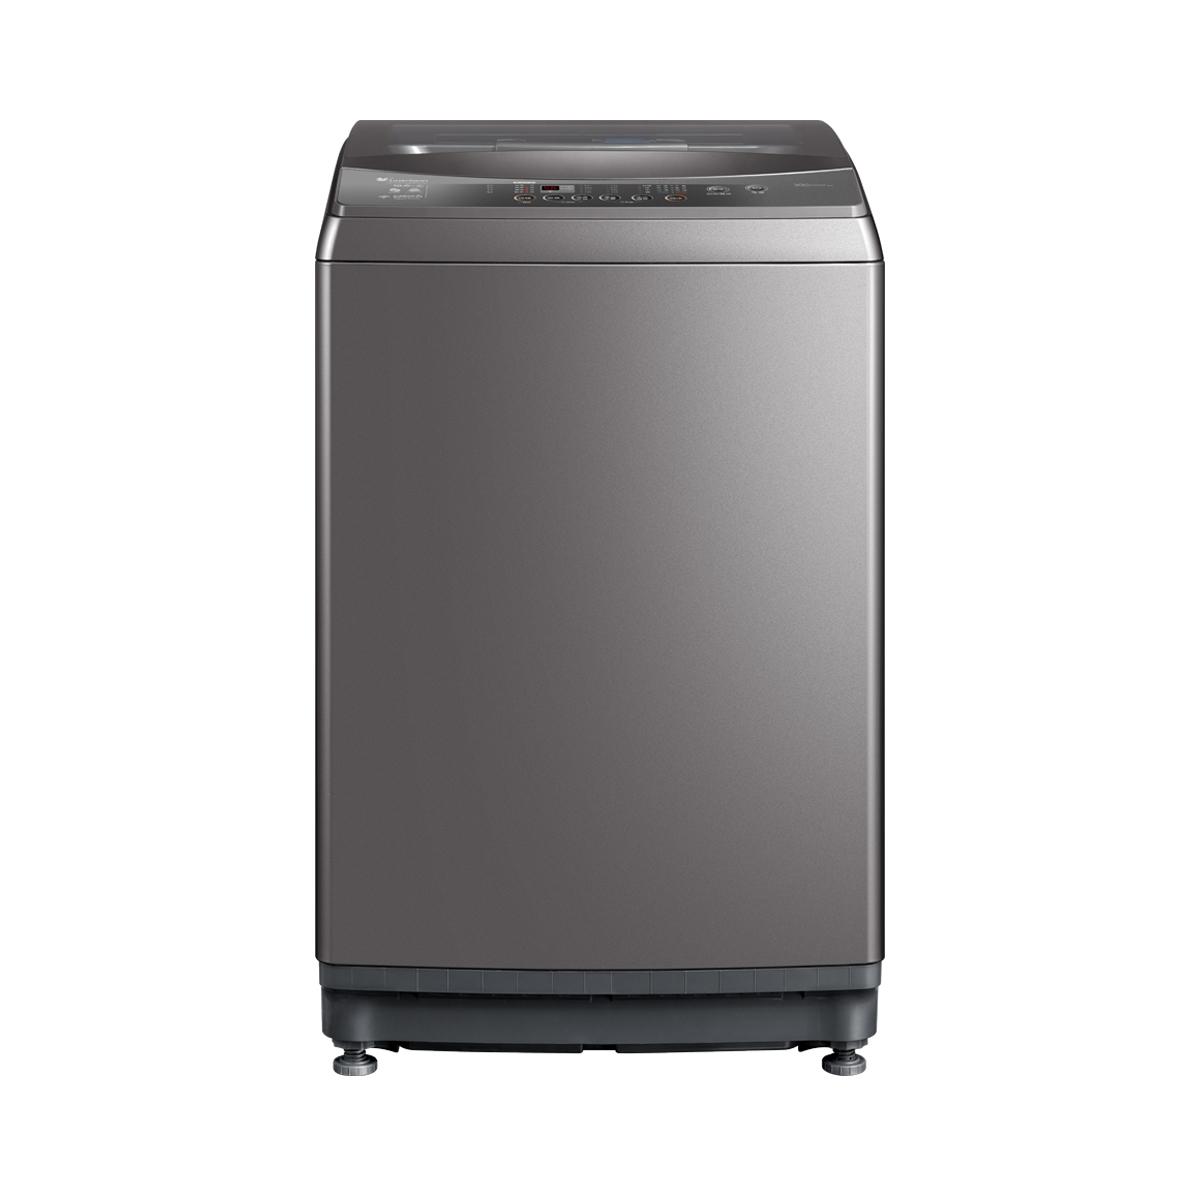 TB100VT818WDCLY 水魔方全自动波轮洗衣机家用变频 kg 公斤 10 小天鹅